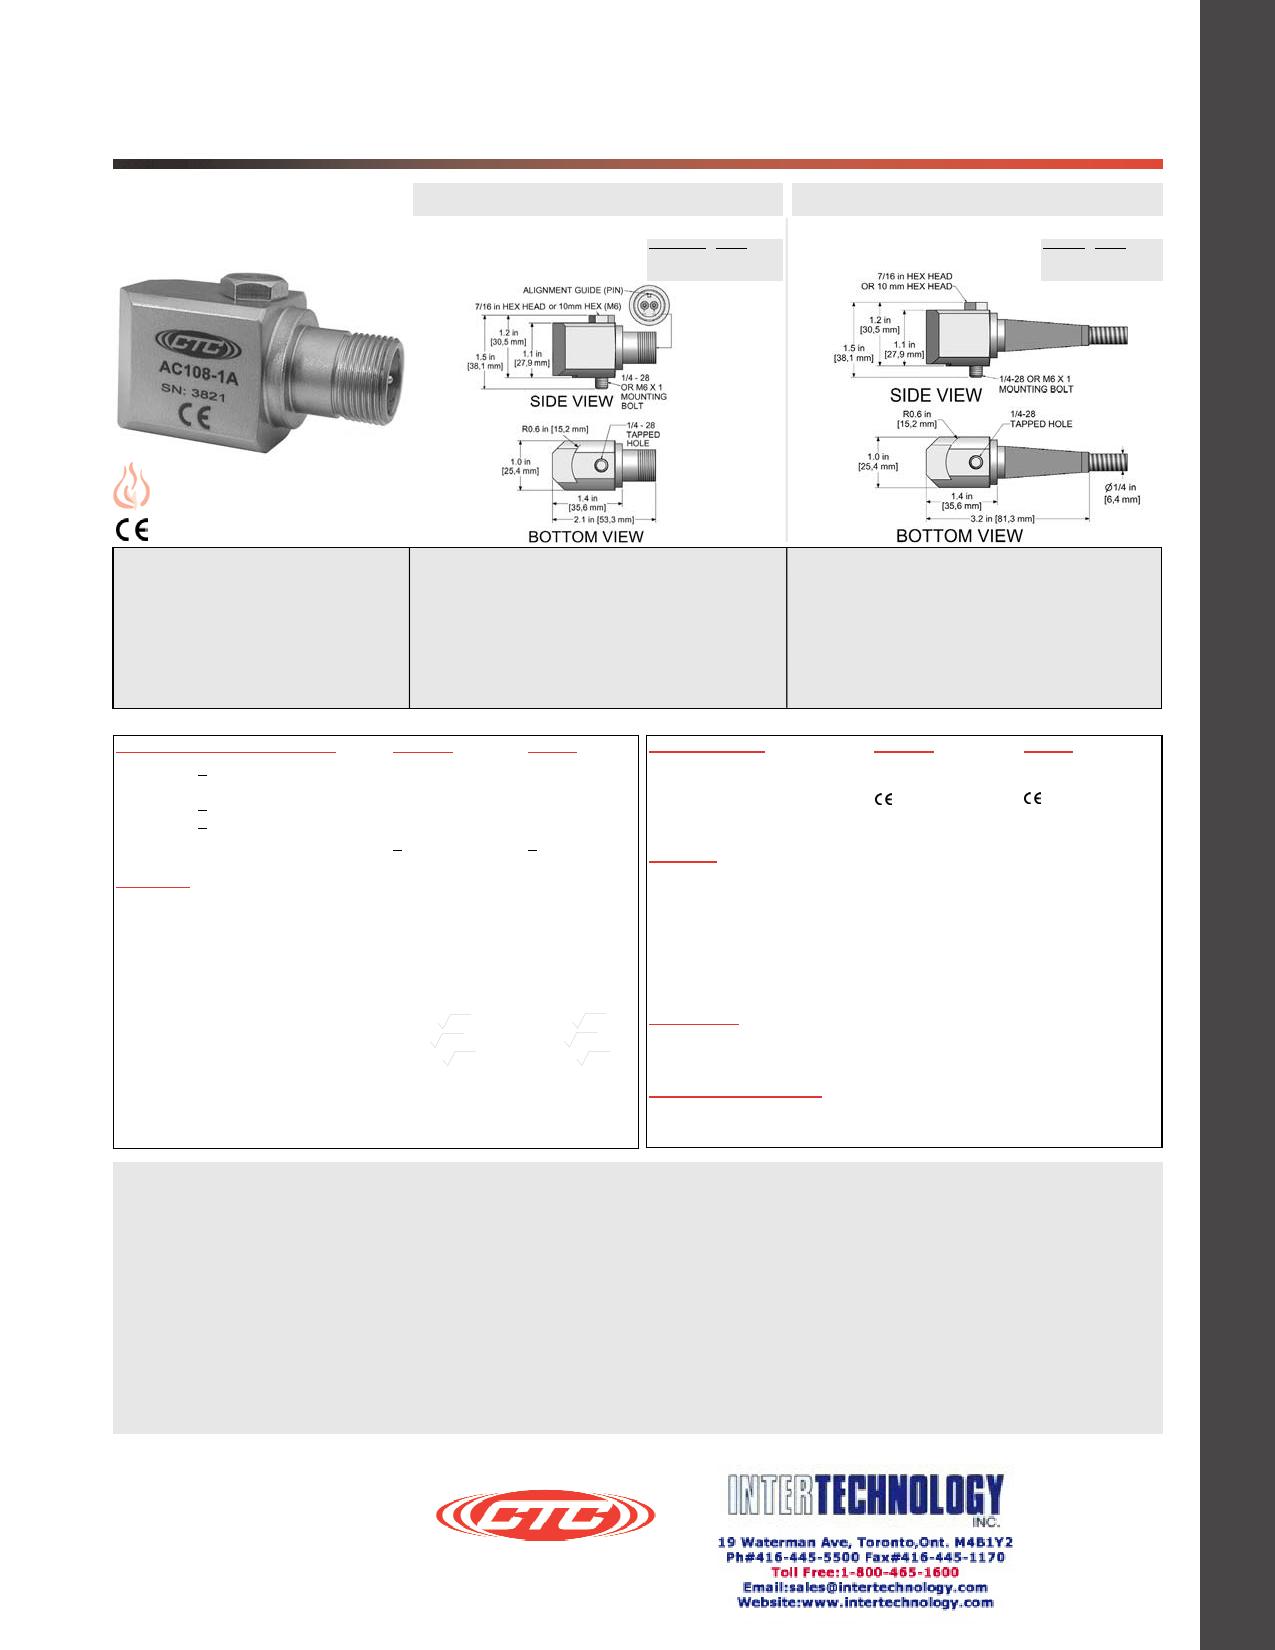 AC108-5A دیتاشیت PDF